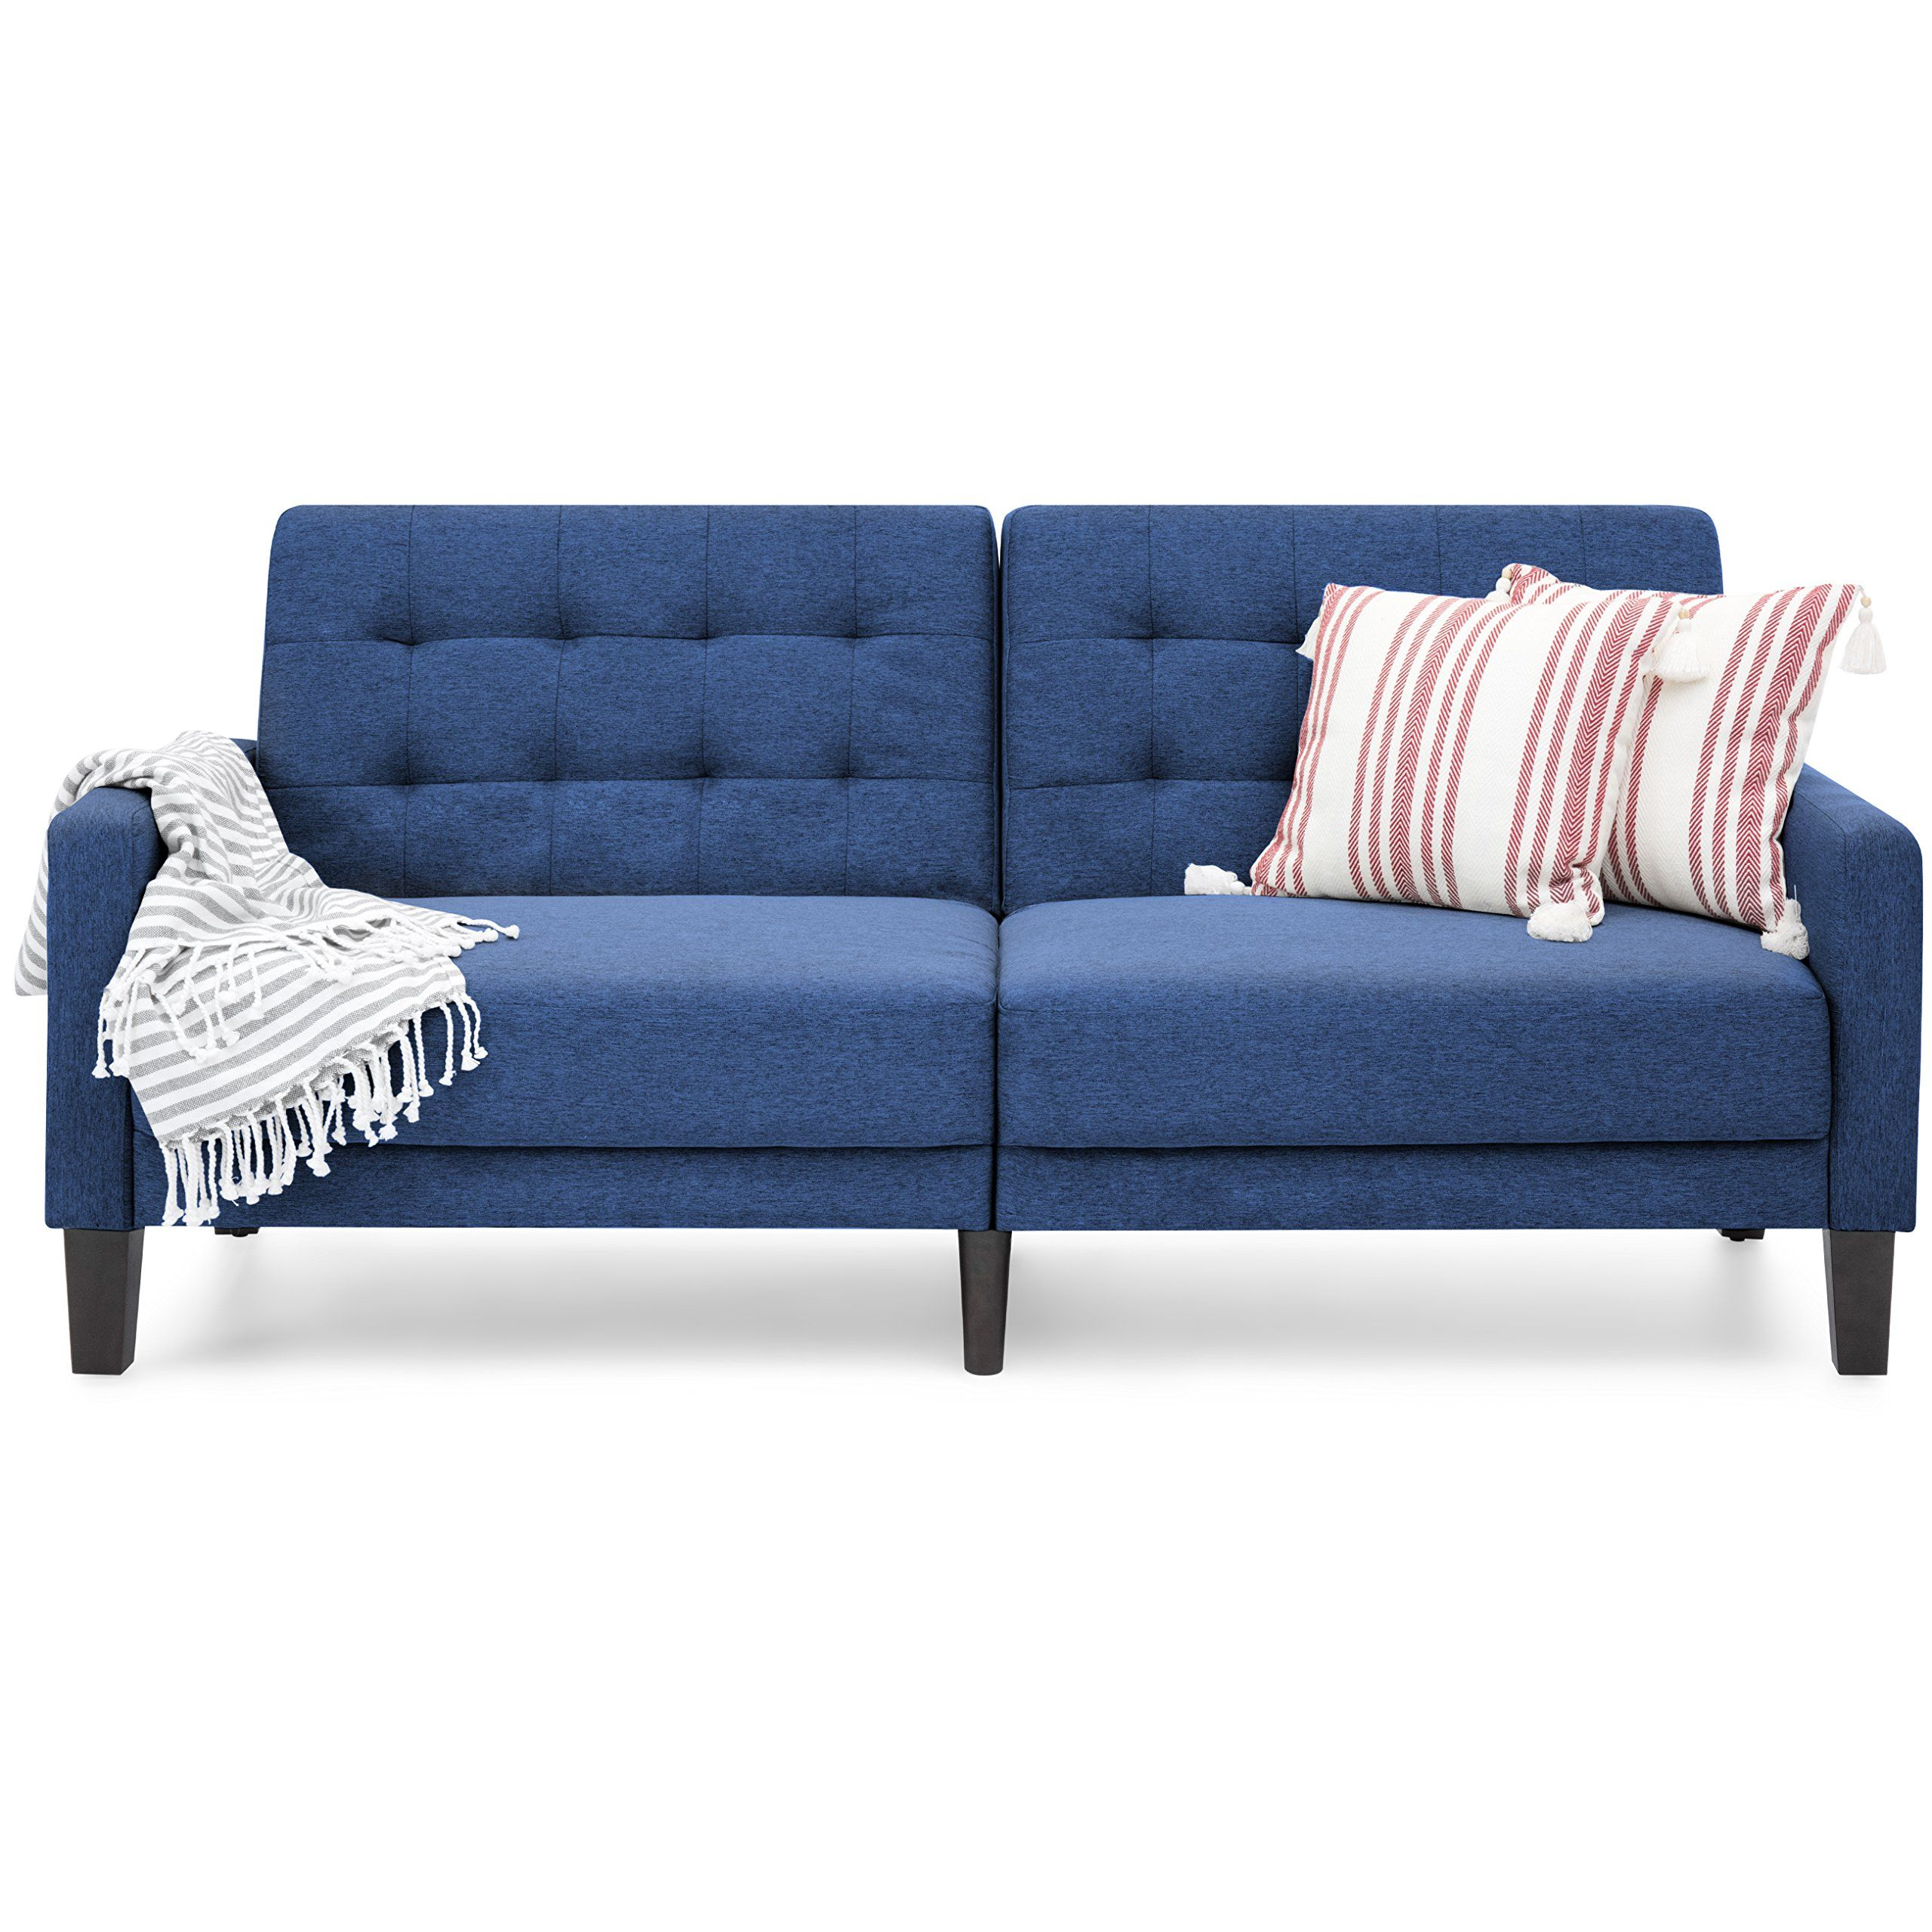 Astonishing Linen Tufted Convertible Sofa Futon Sleeper Versatile Split Machost Co Dining Chair Design Ideas Machostcouk